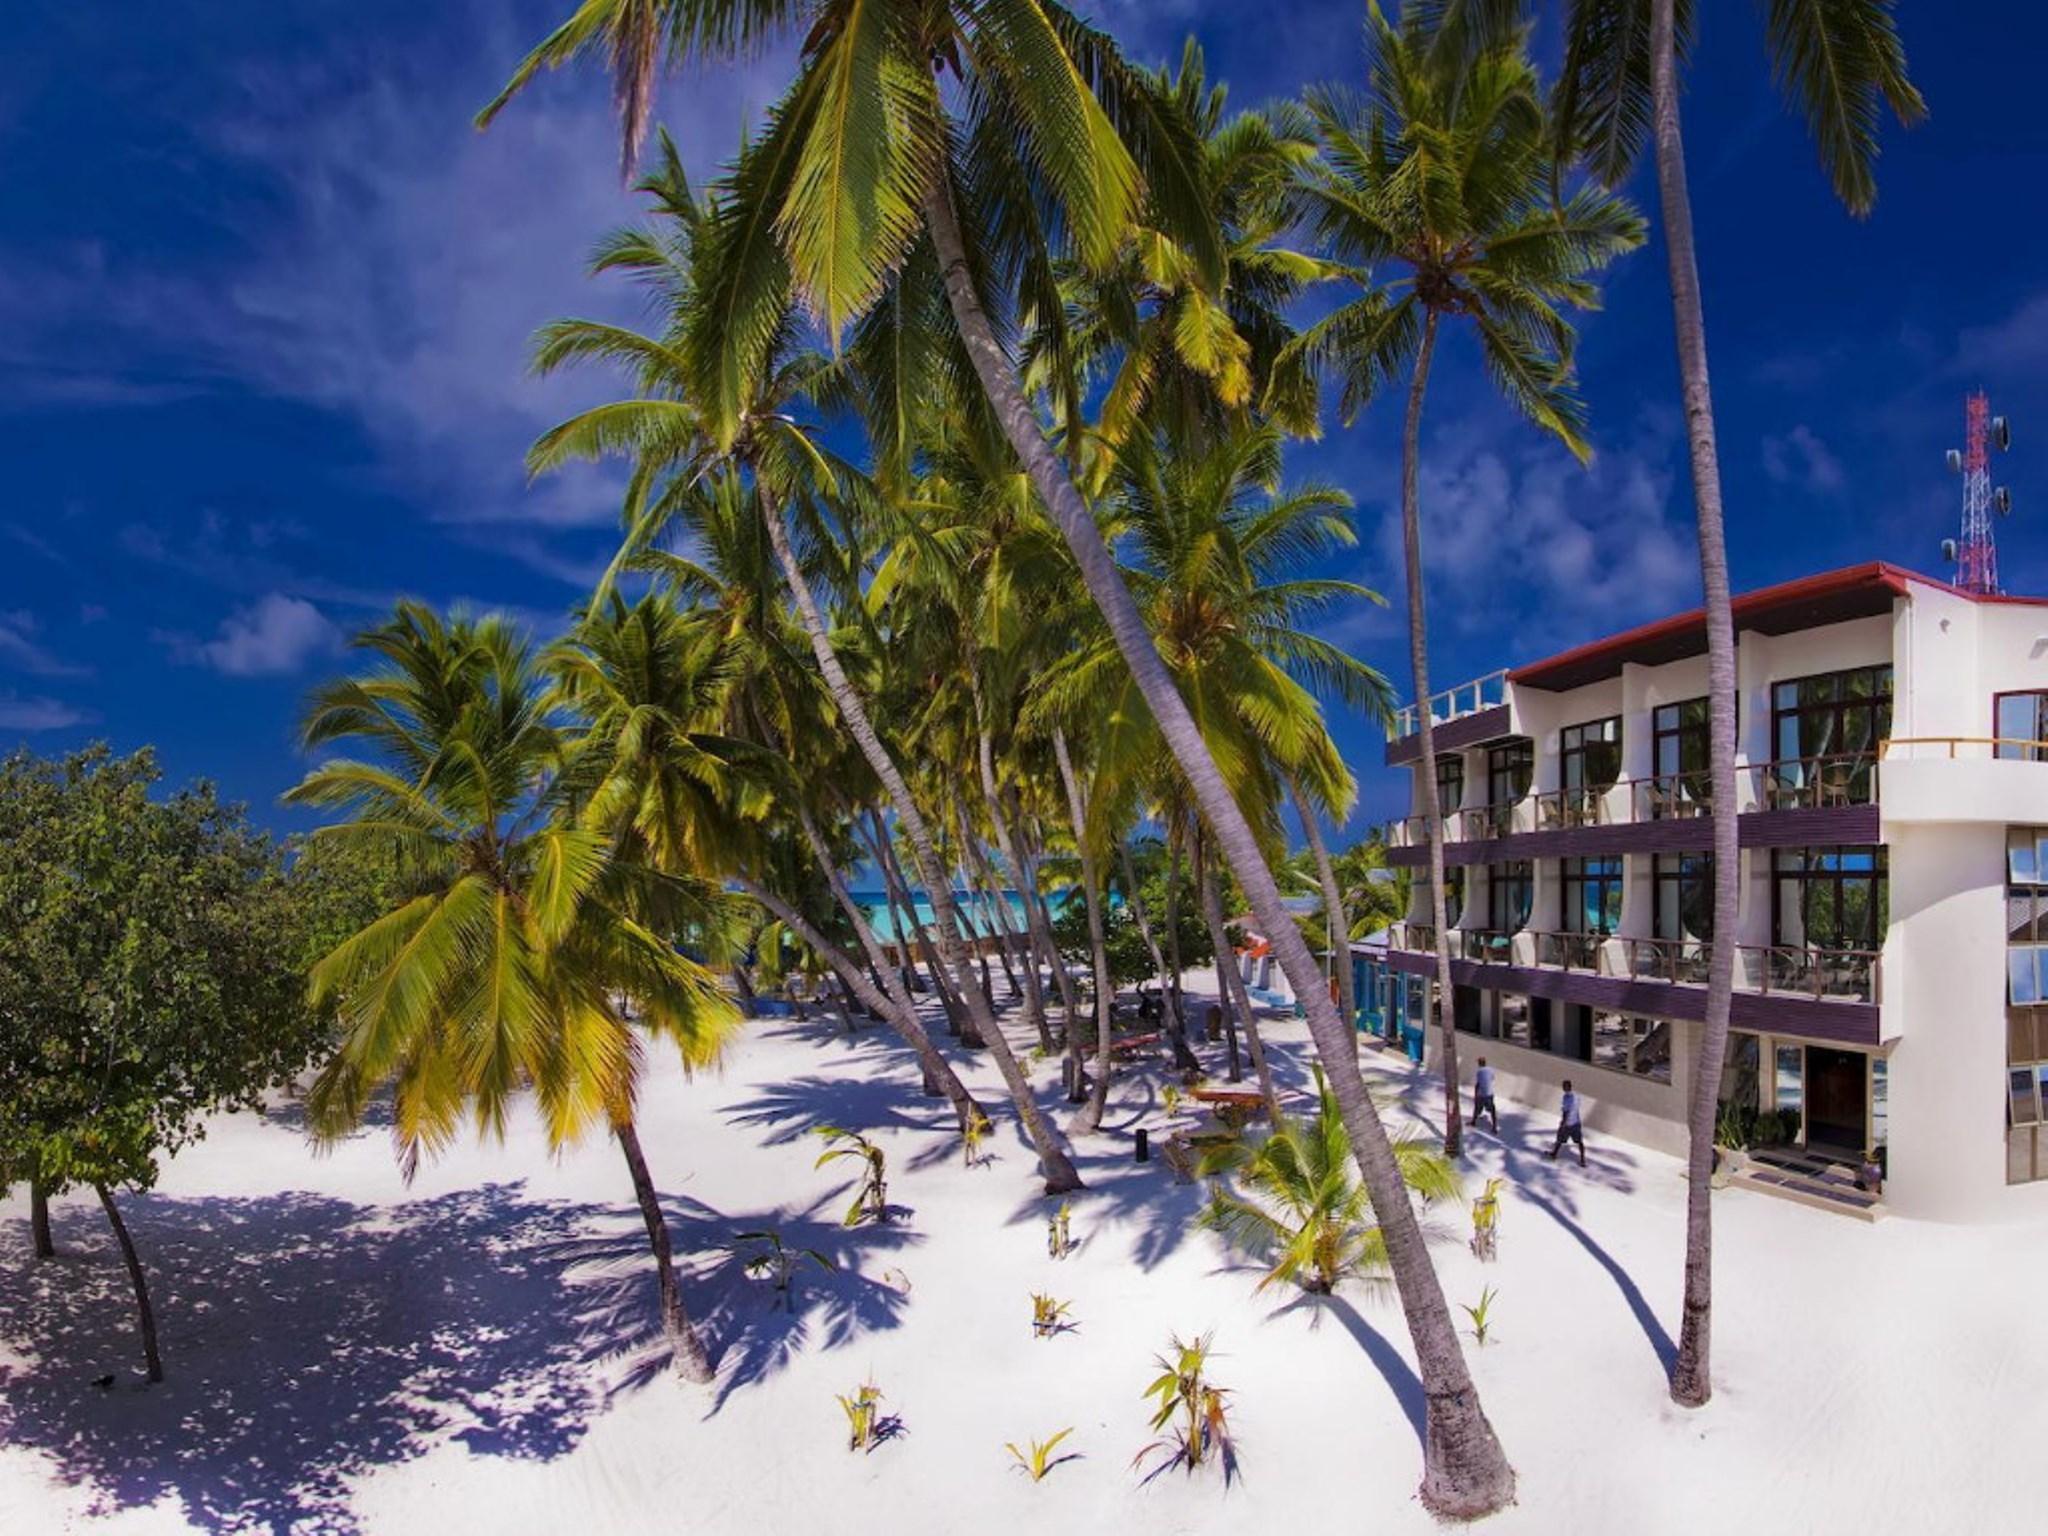 Kaani Beach Hotel at Maafushi, Kepulauan Maafushi